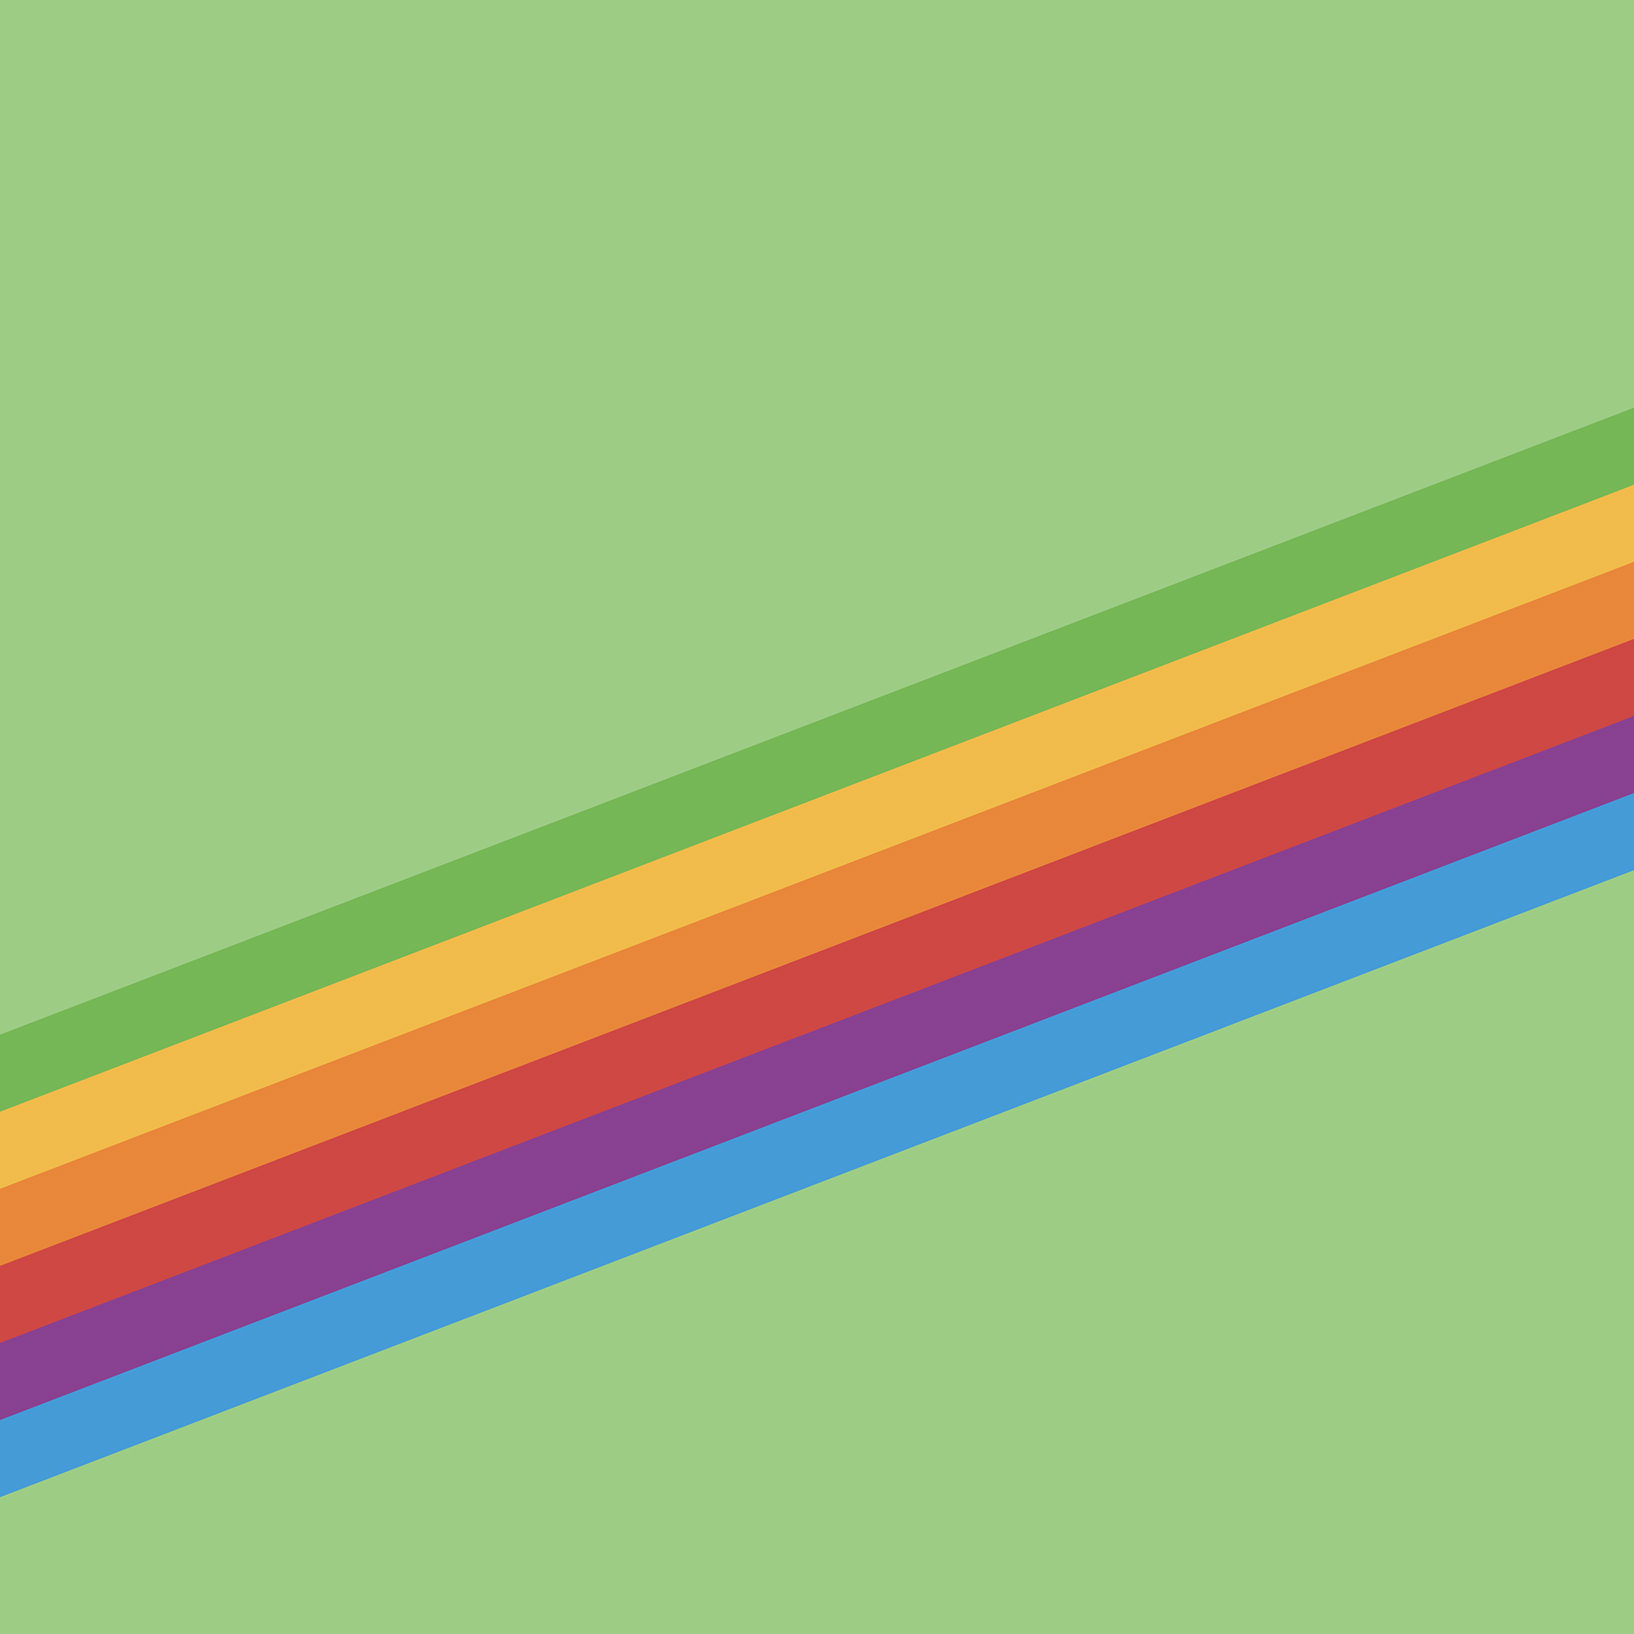 iOS_11_GM_Wallpaper_Heritage – Stripe Green